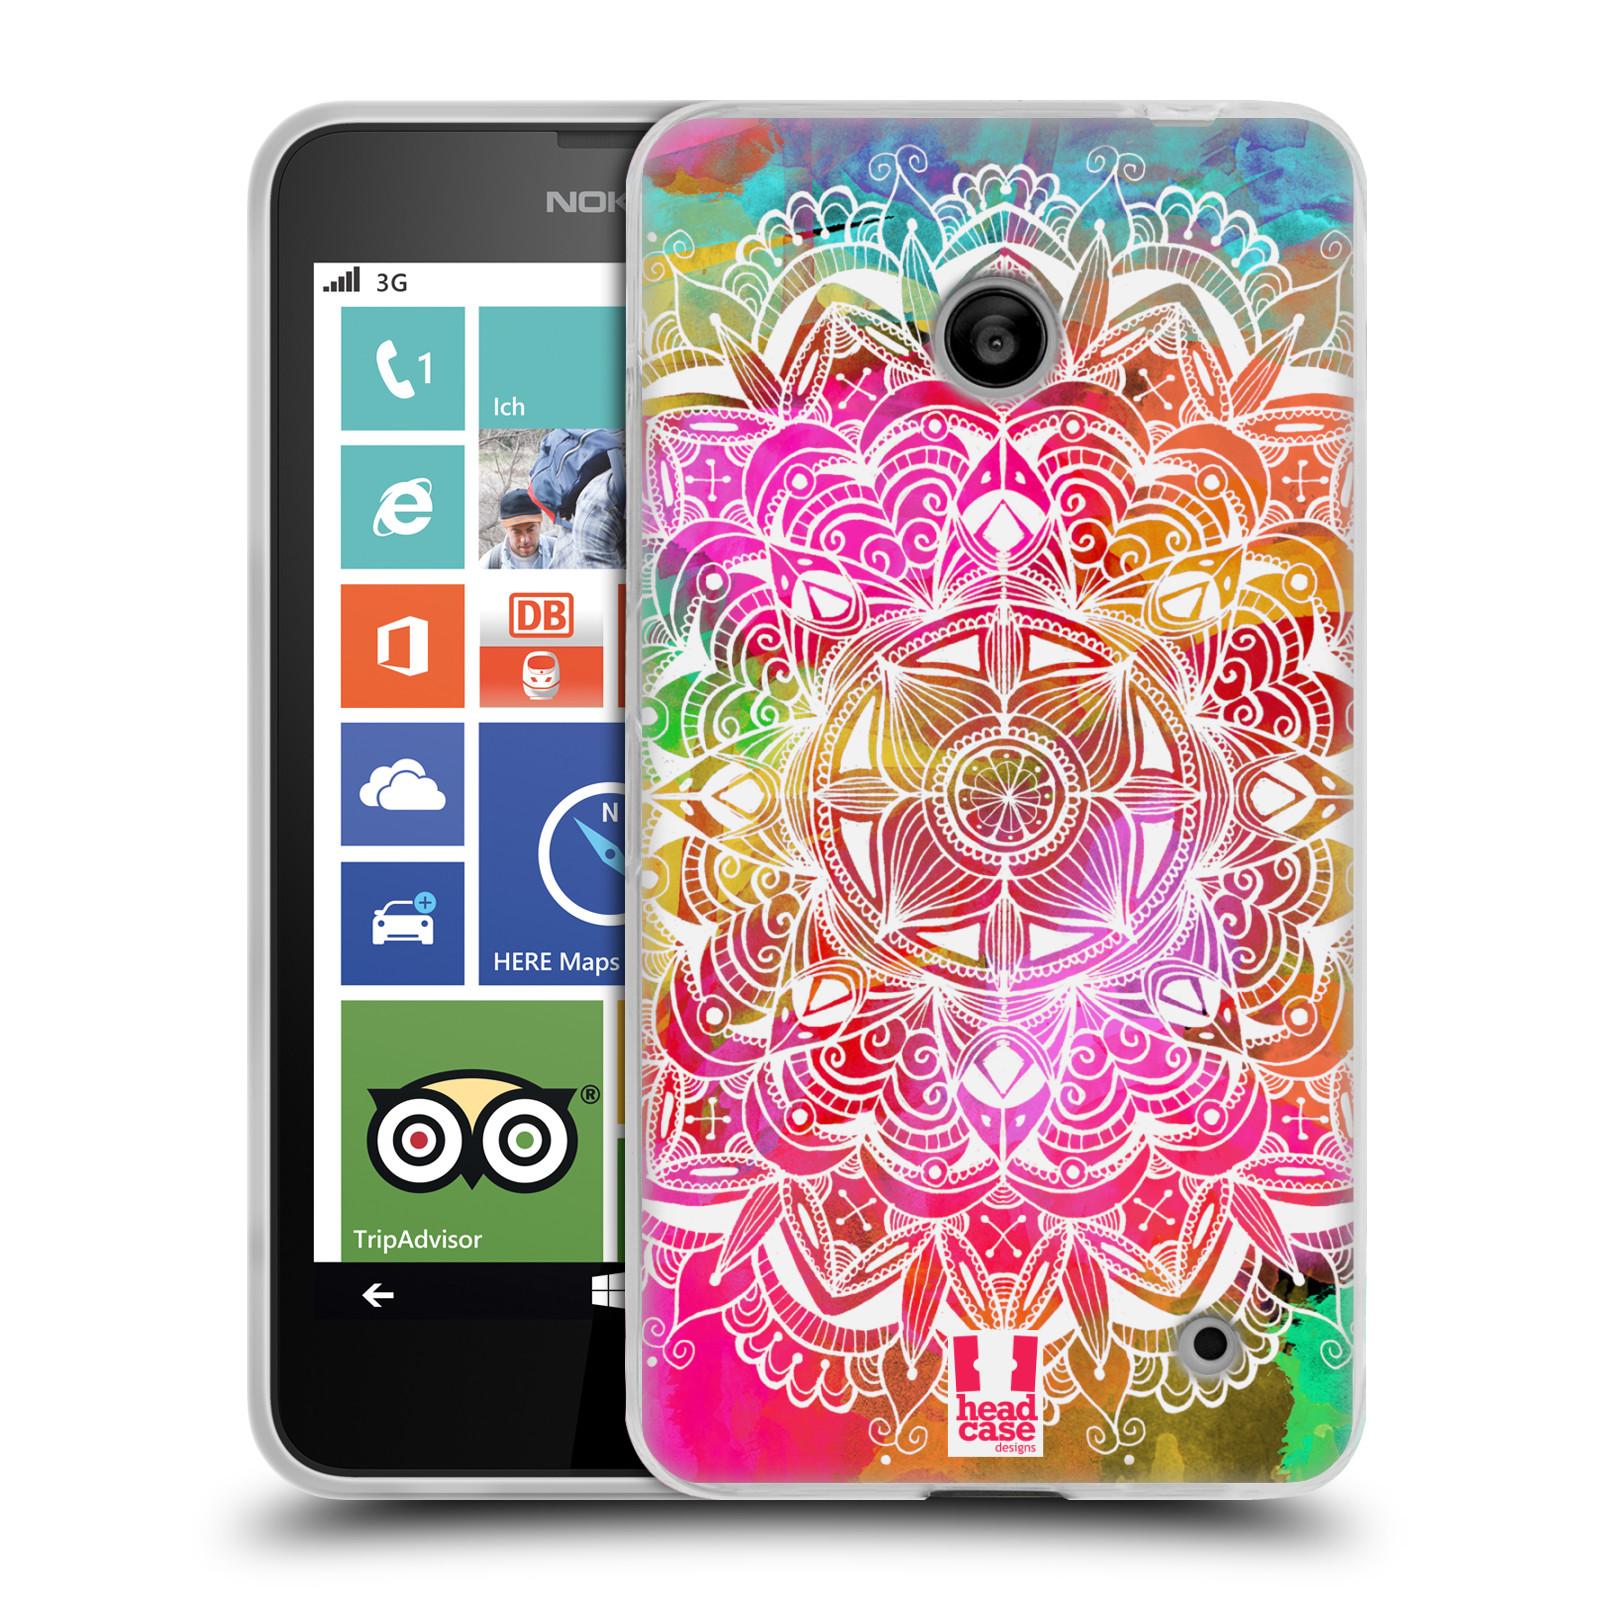 Silikonové pouzdro na mobil Nokia Lumia 630 HEAD CASE Mandala Doodle Watercolour (Silikonový kryt či obal na mobilní telefon Nokia Lumia 630 a Nokia Lumia 630 Dual SIM)